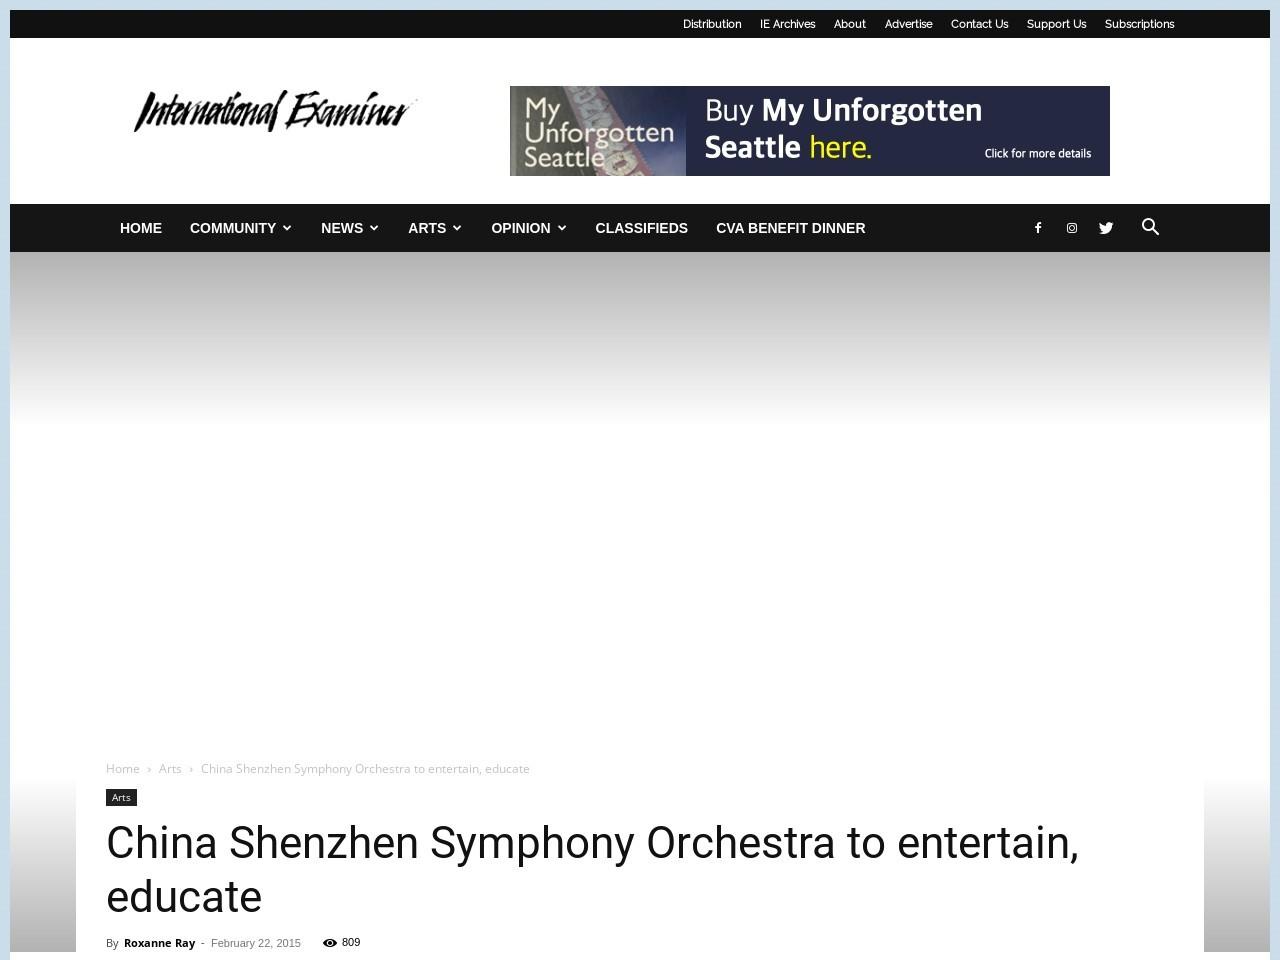 China Shenzhen Symphony Orchestra to entertain, educate